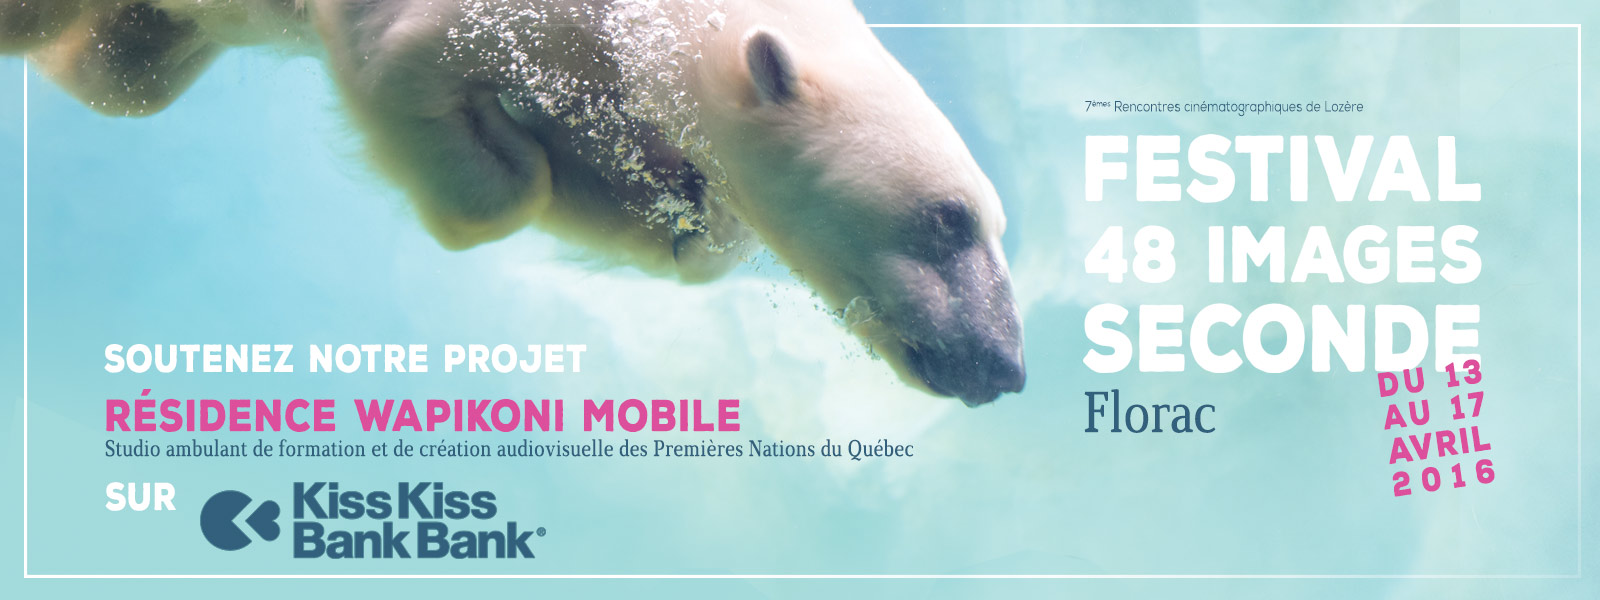 Résidence Wapikoni mobile… Soutenez-nous !